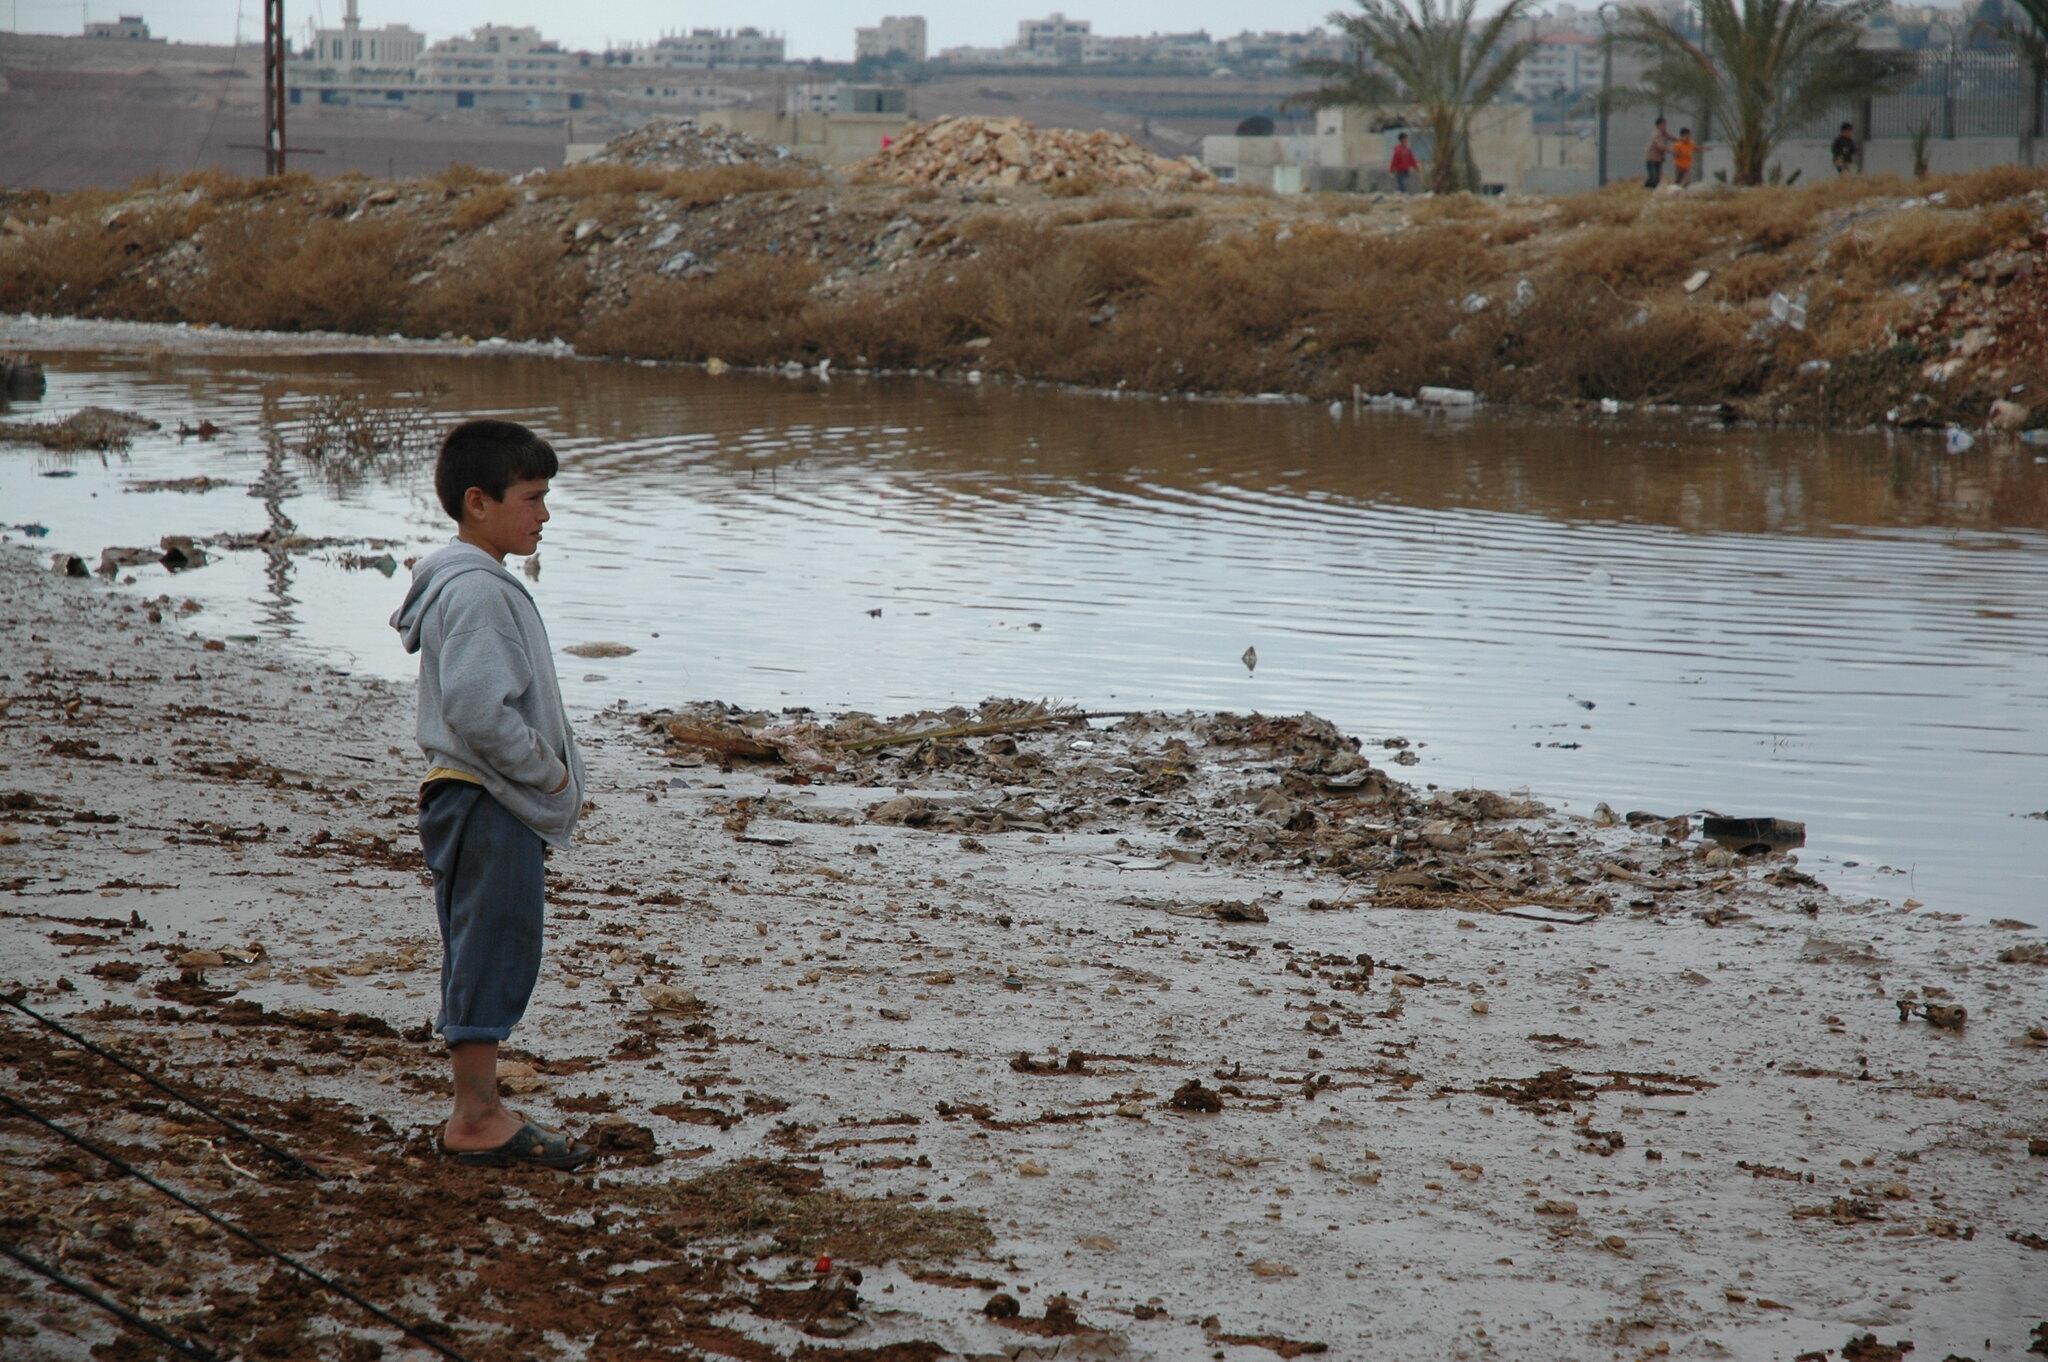 Syria flooding devastates refugees, believers deliver help and hope